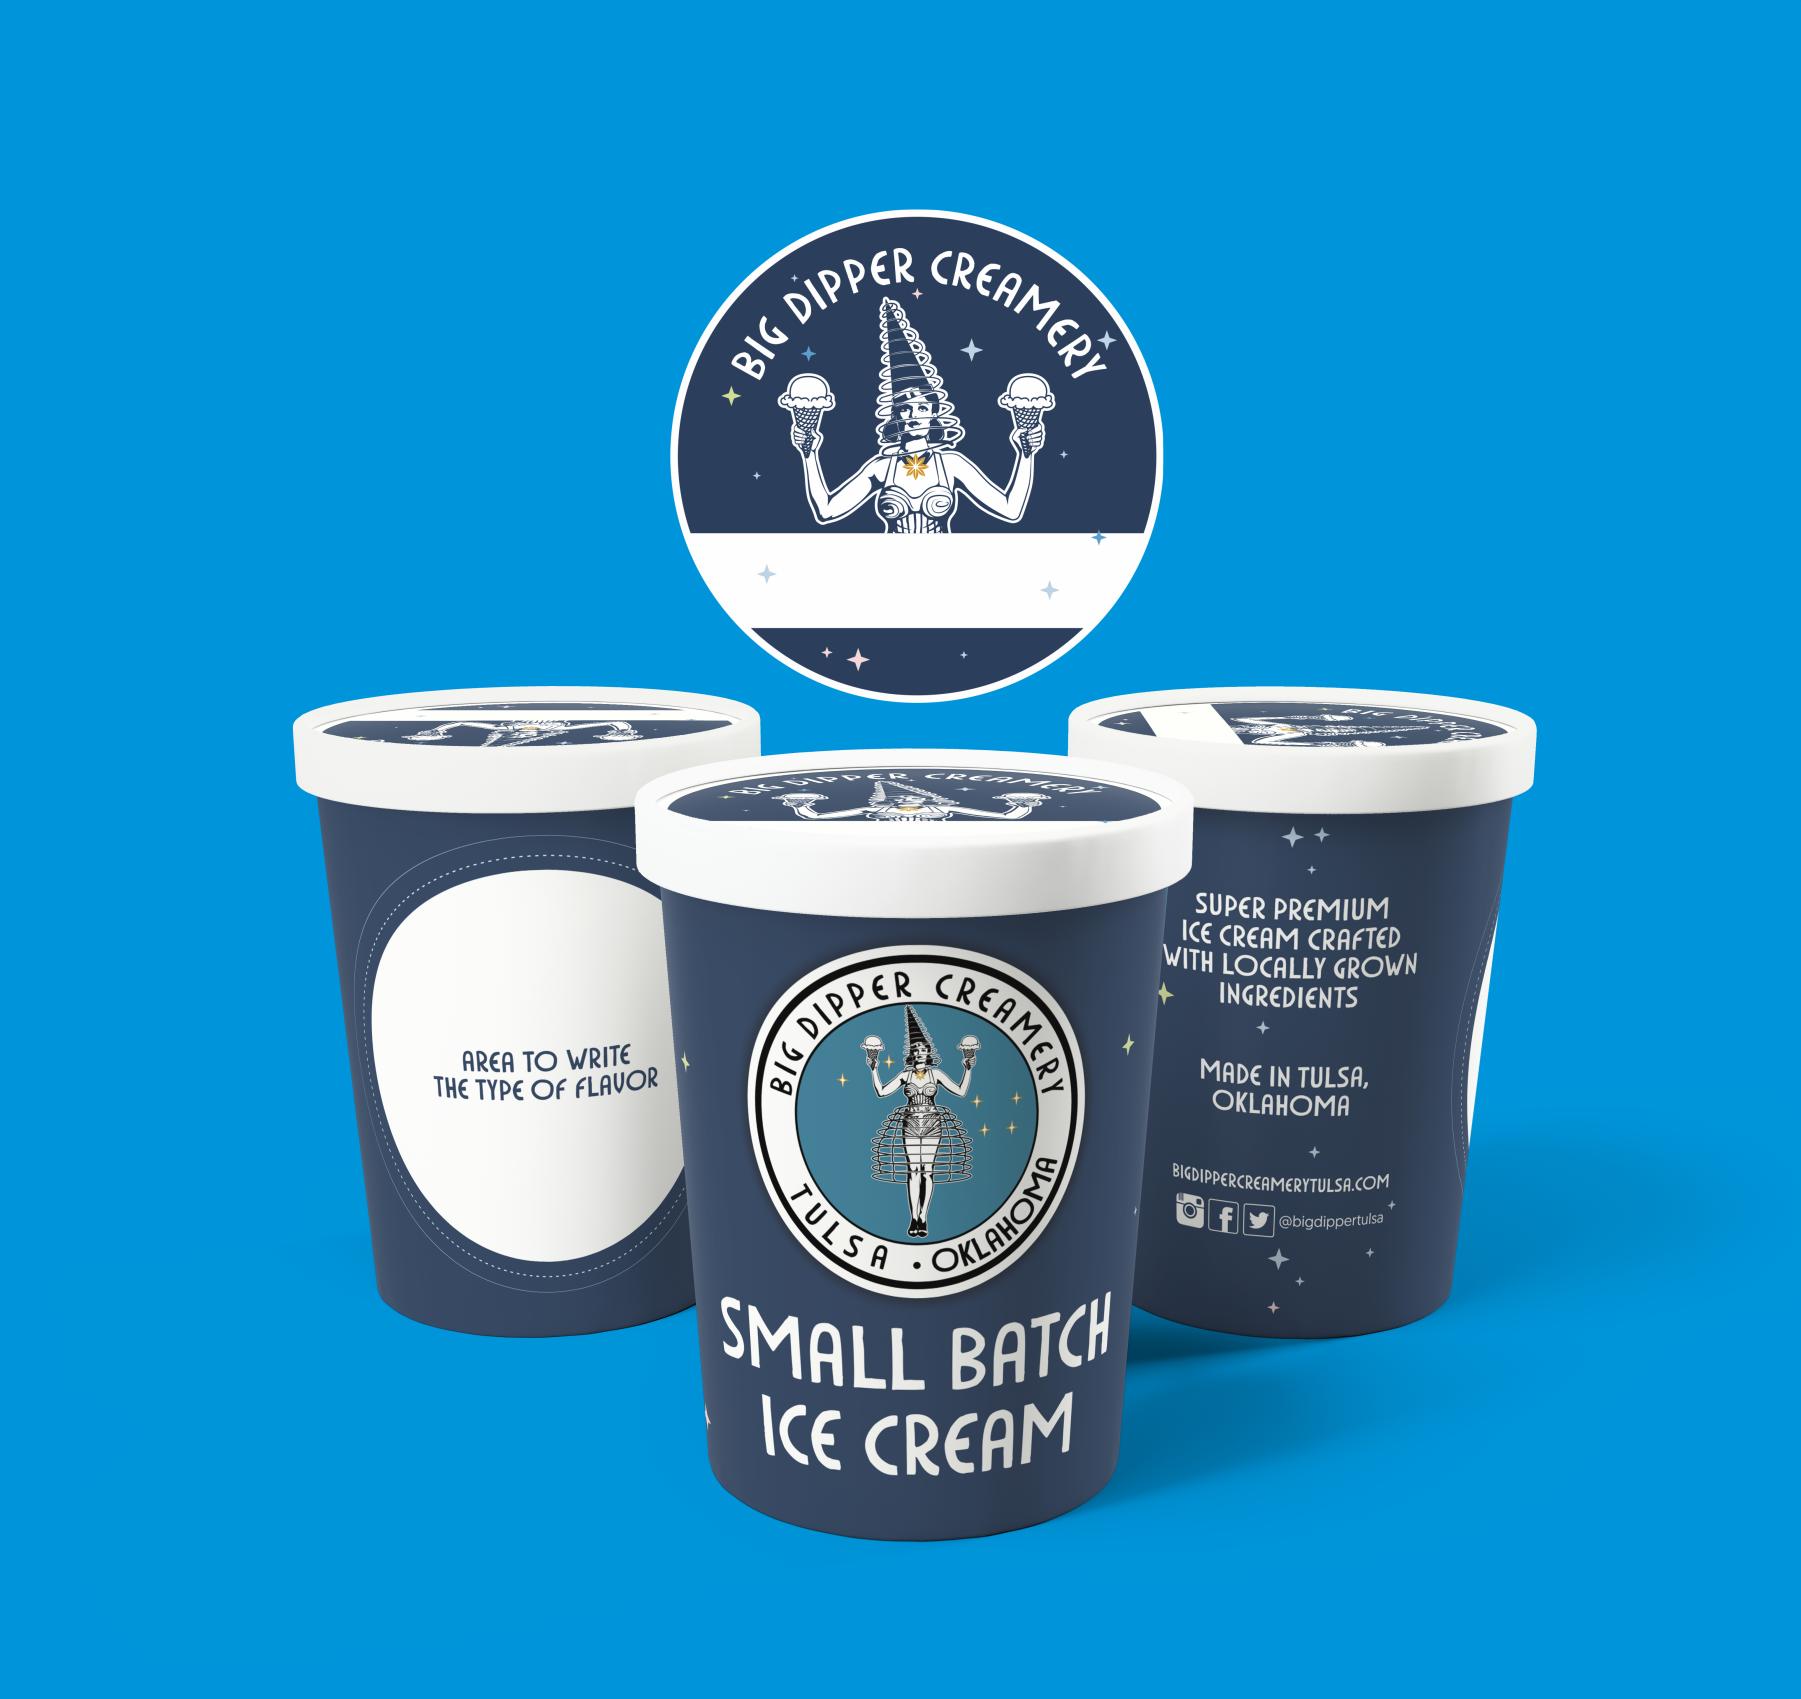 small batch ice cream shop needs a pint label